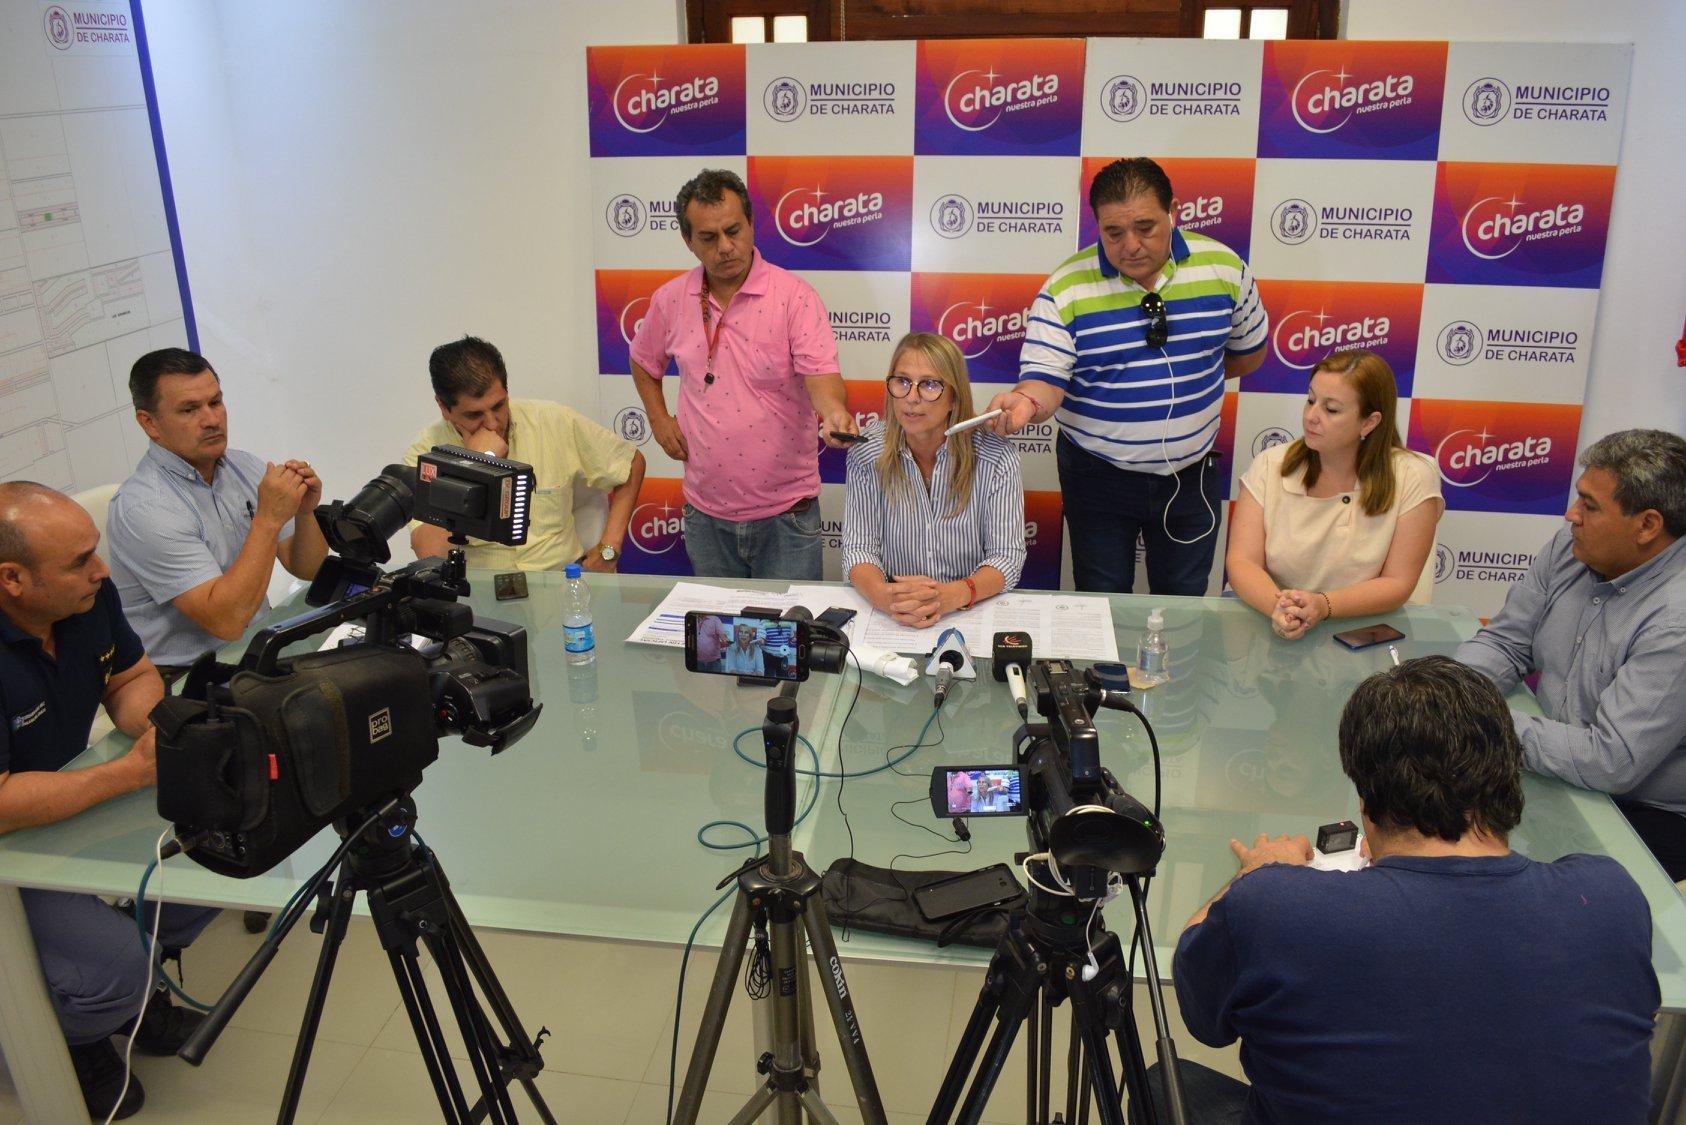 Charata: Chomiak anuncio medidas para prevenir Coronavirus en la localidad